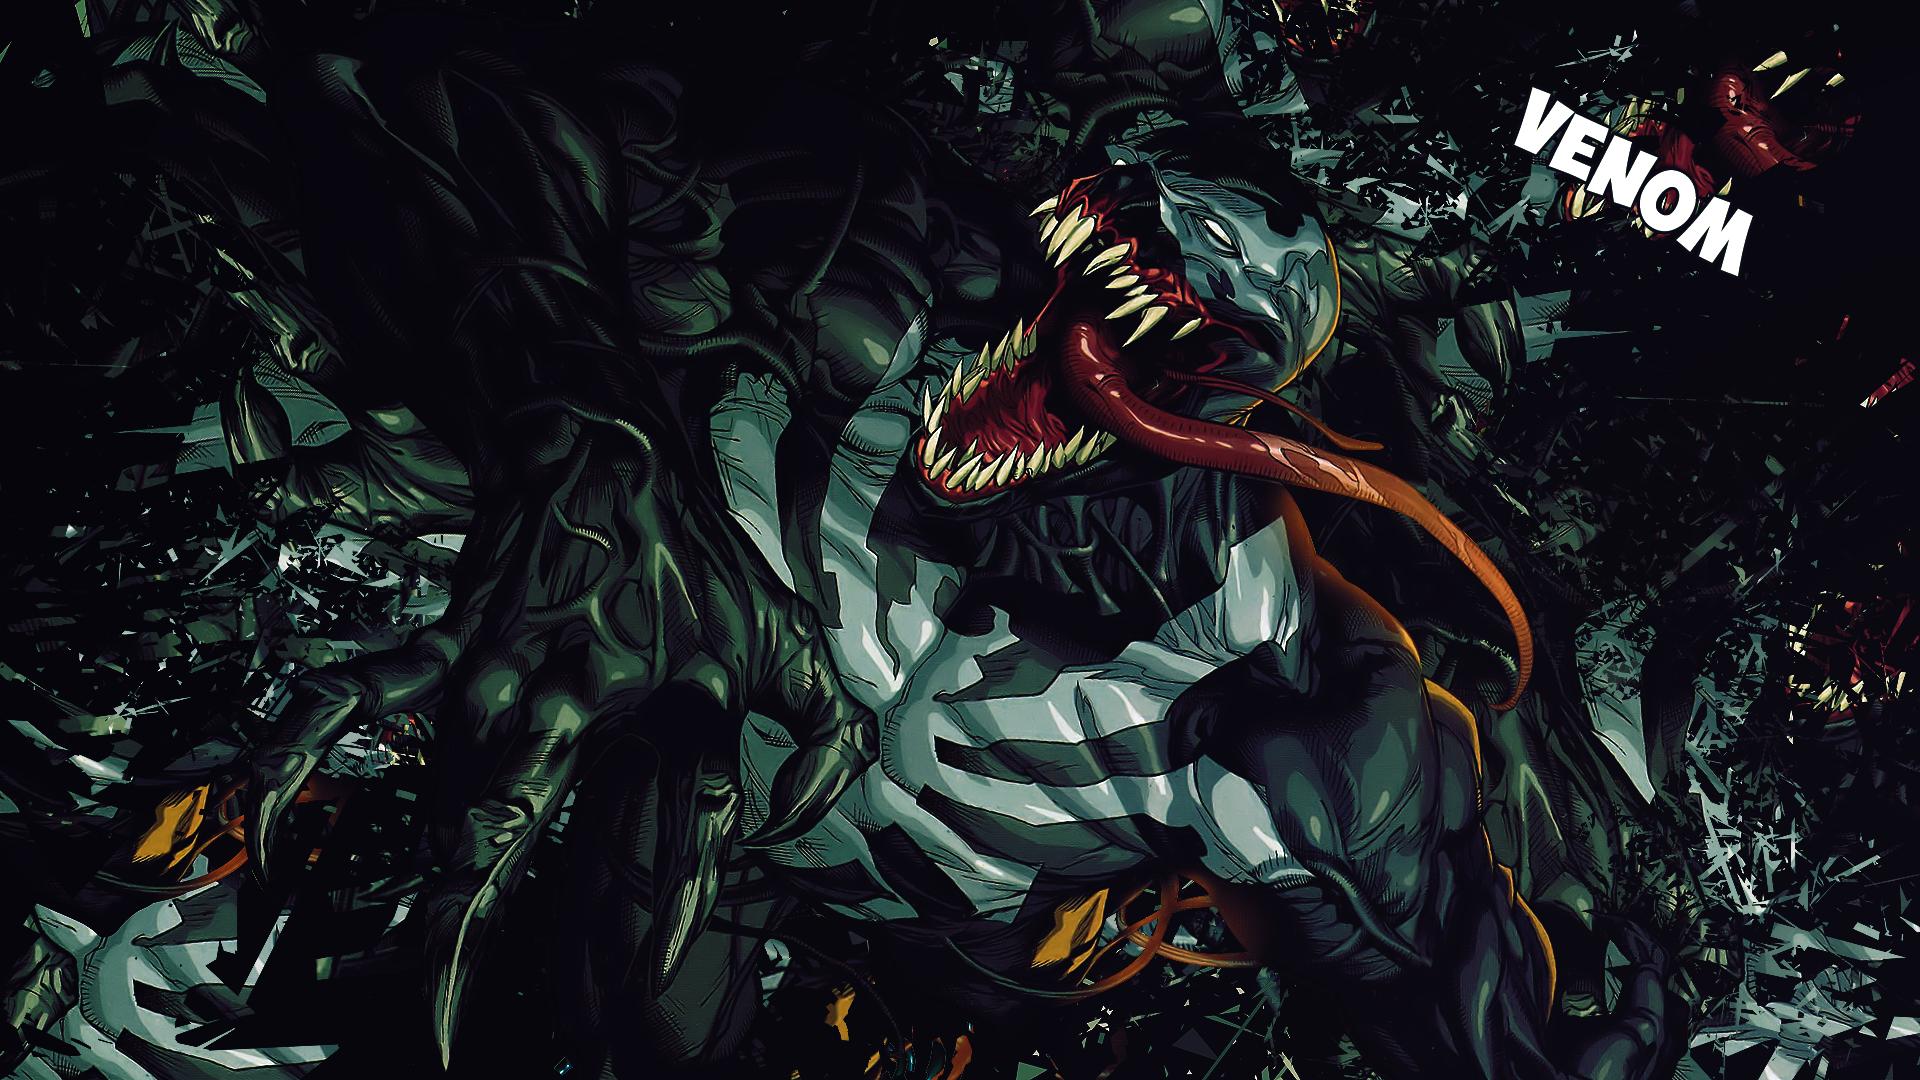 Venom Wallpaper 9 263734 Images HD Wallpapers